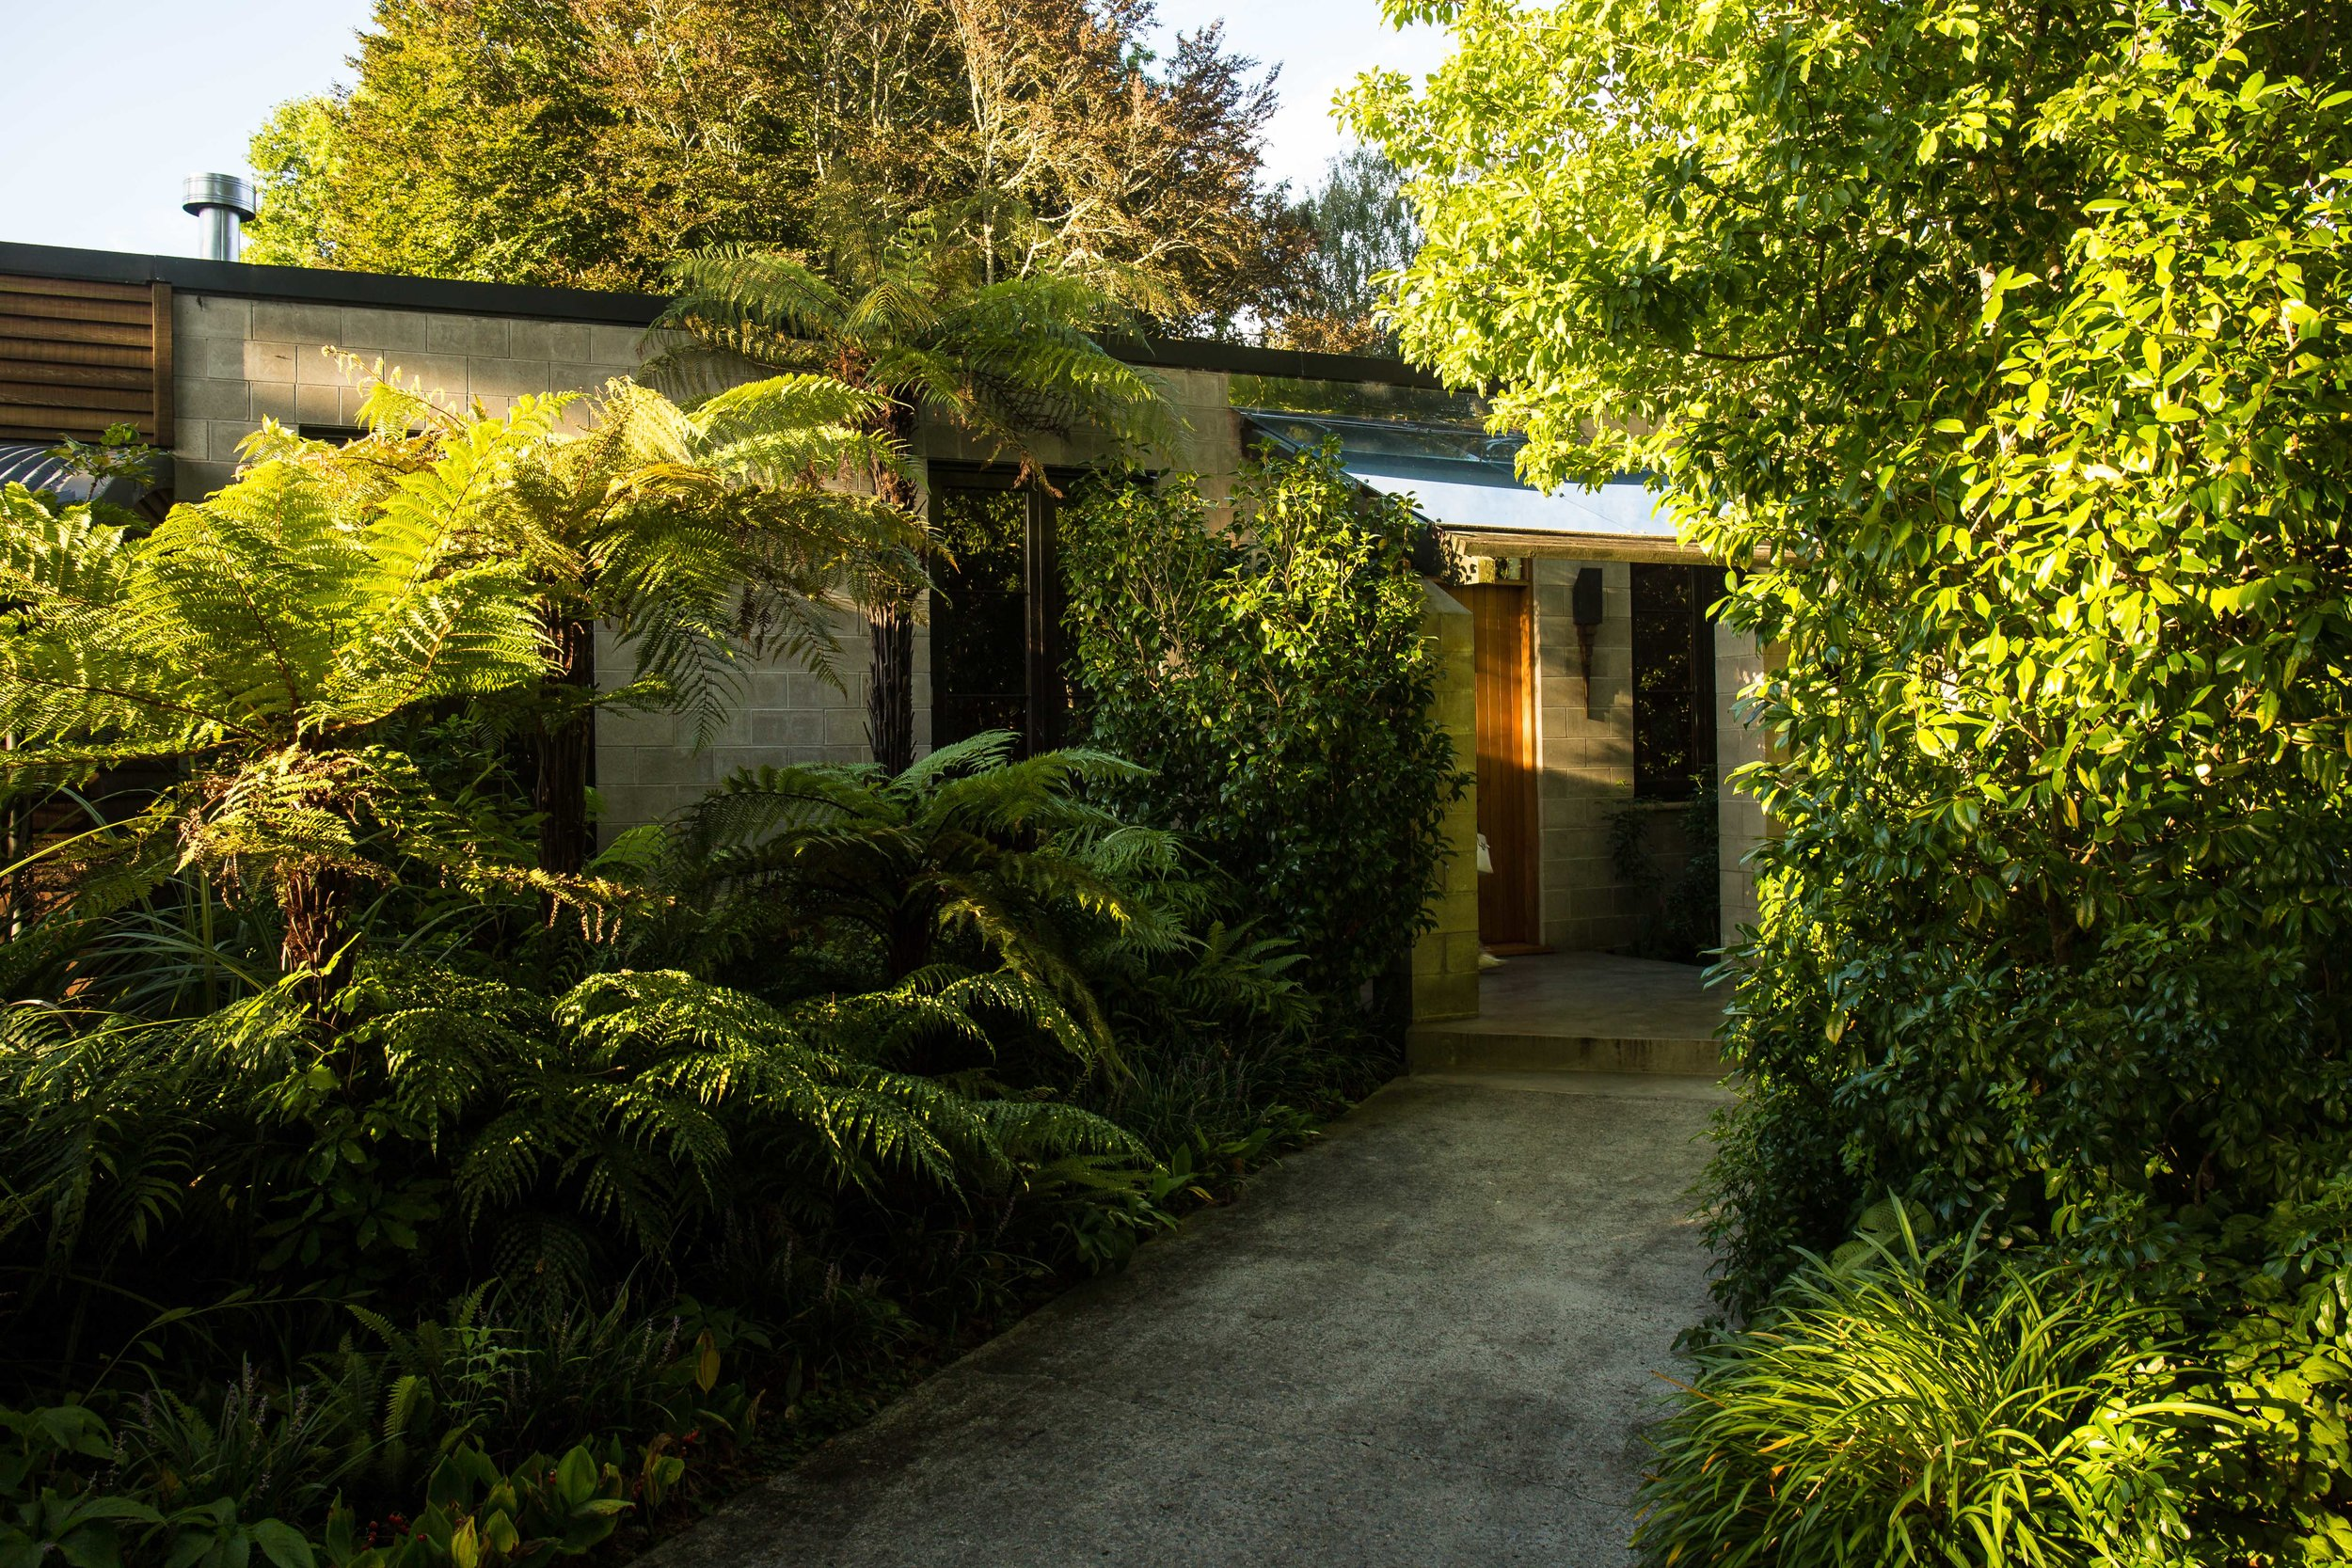 Lodge Entrance - Reached through impressive green gardens.